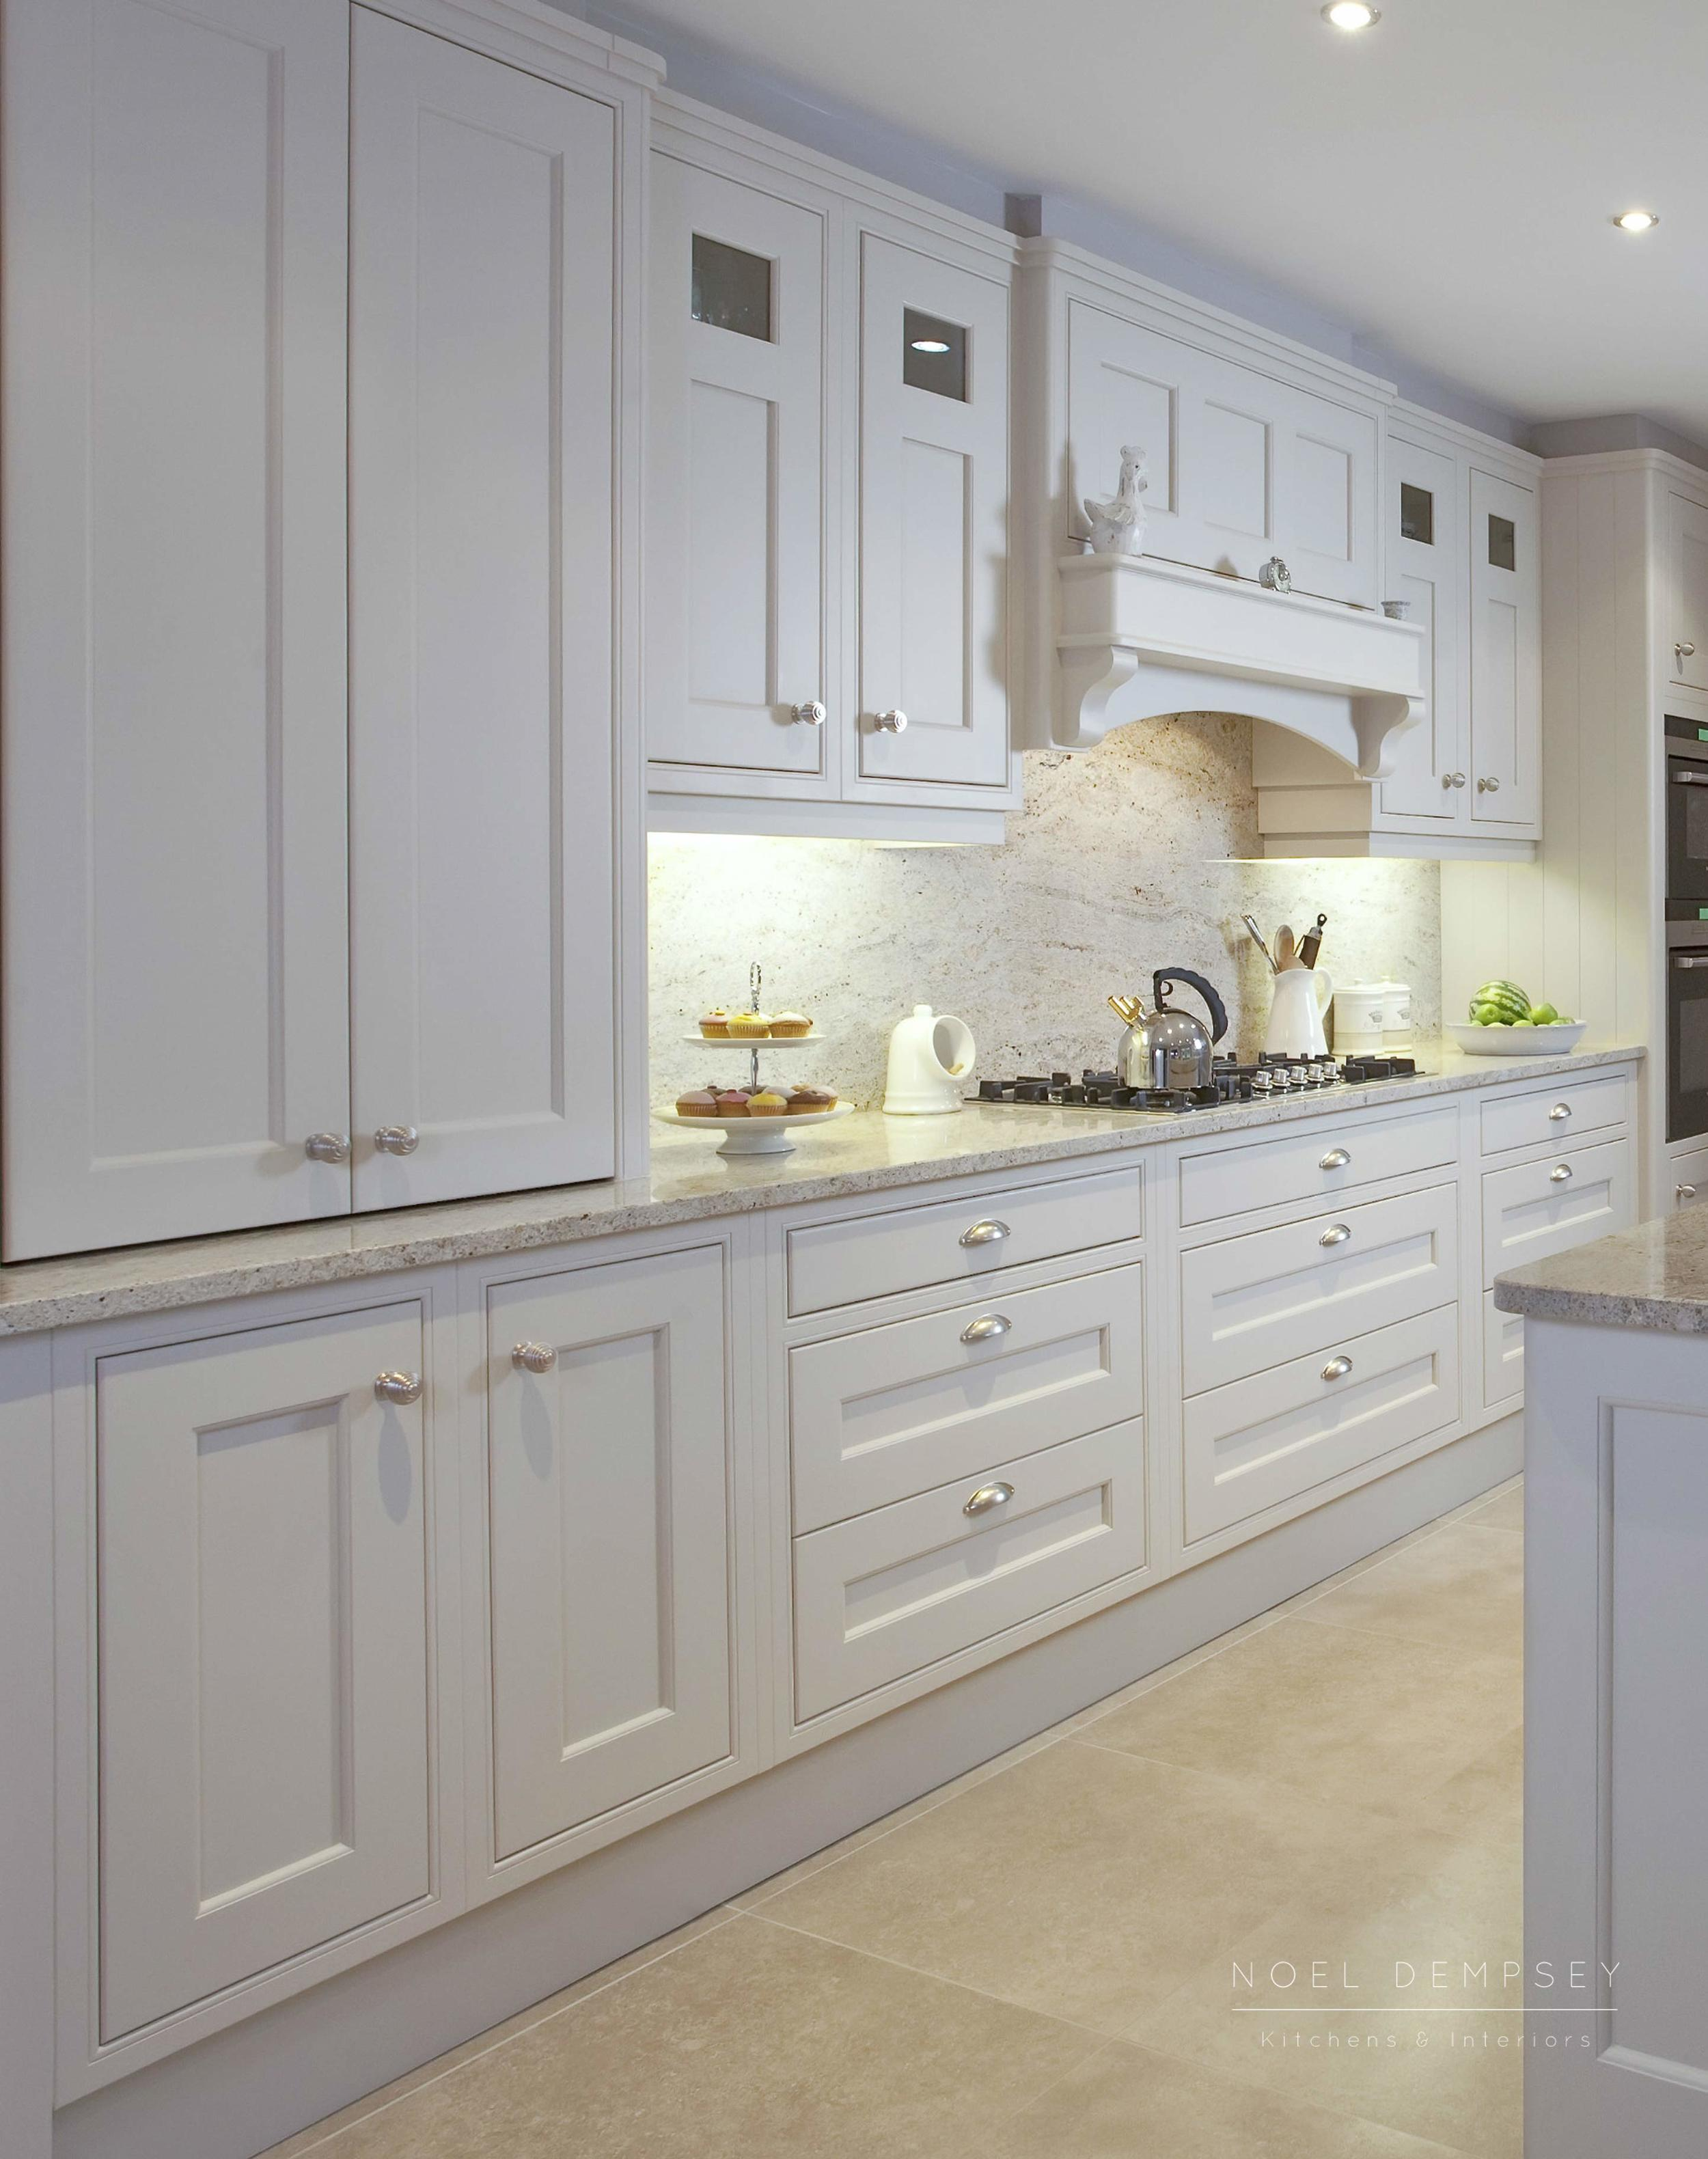 Pemberton-inframe-kitchen-3.jpg